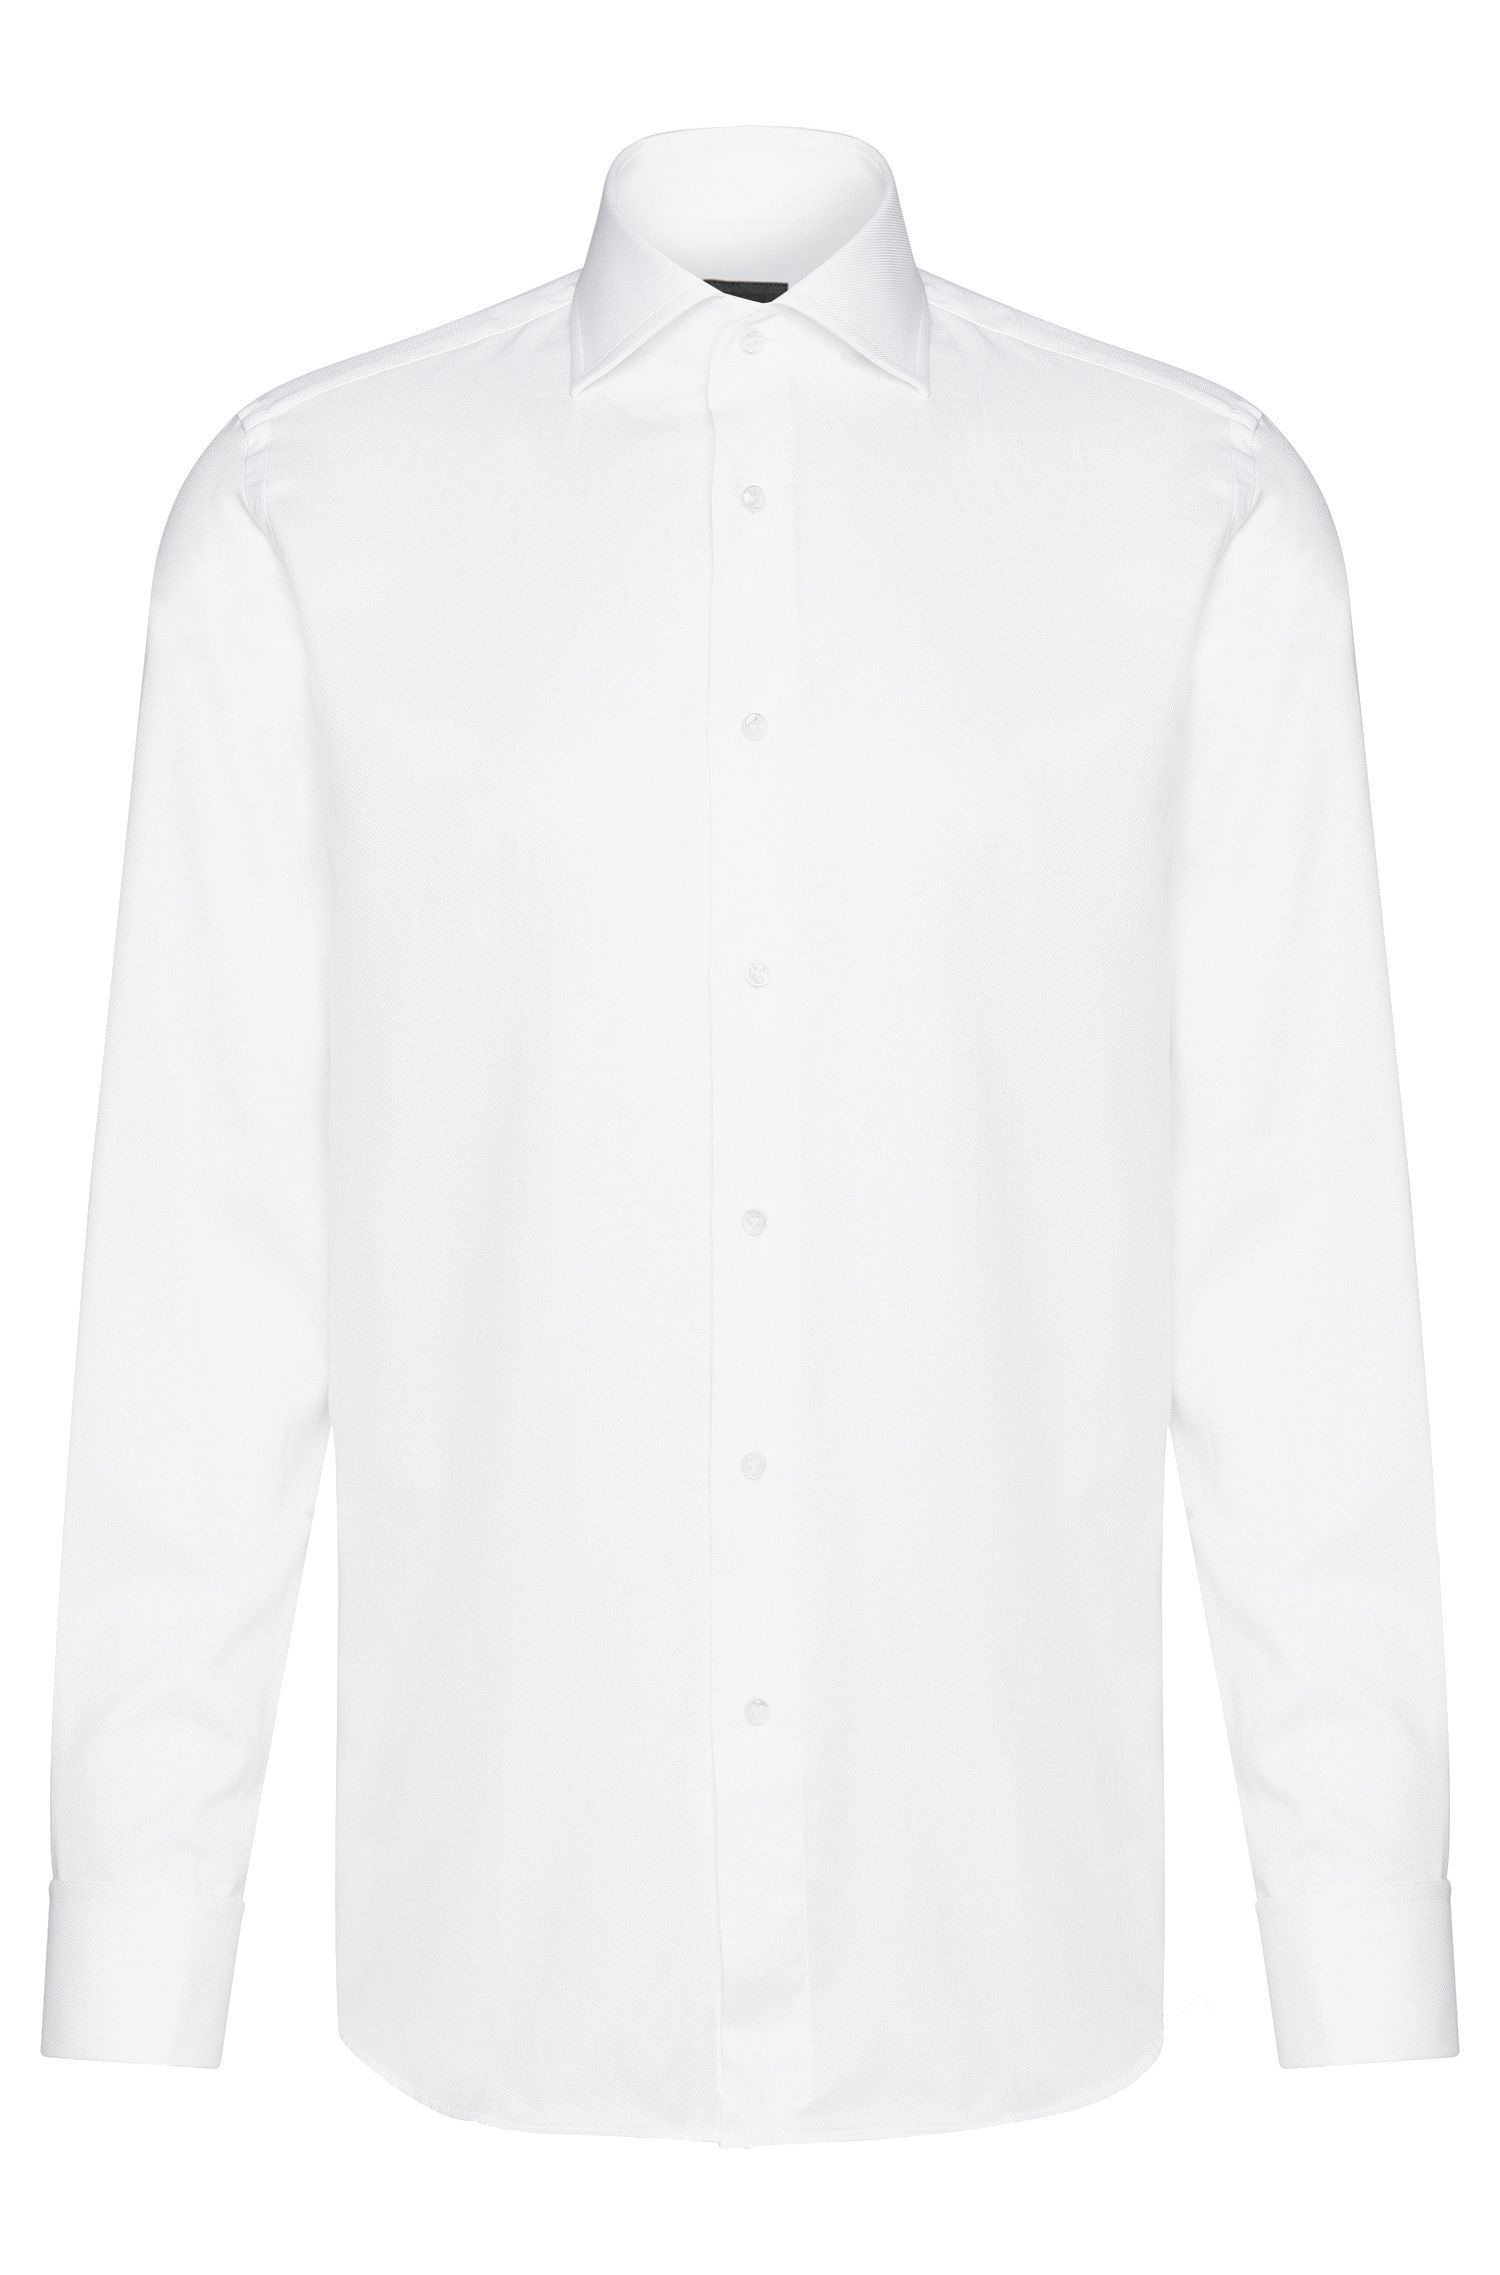 Egyptian Cotton Dress Shirt, Slim Fit | T-Stan, White